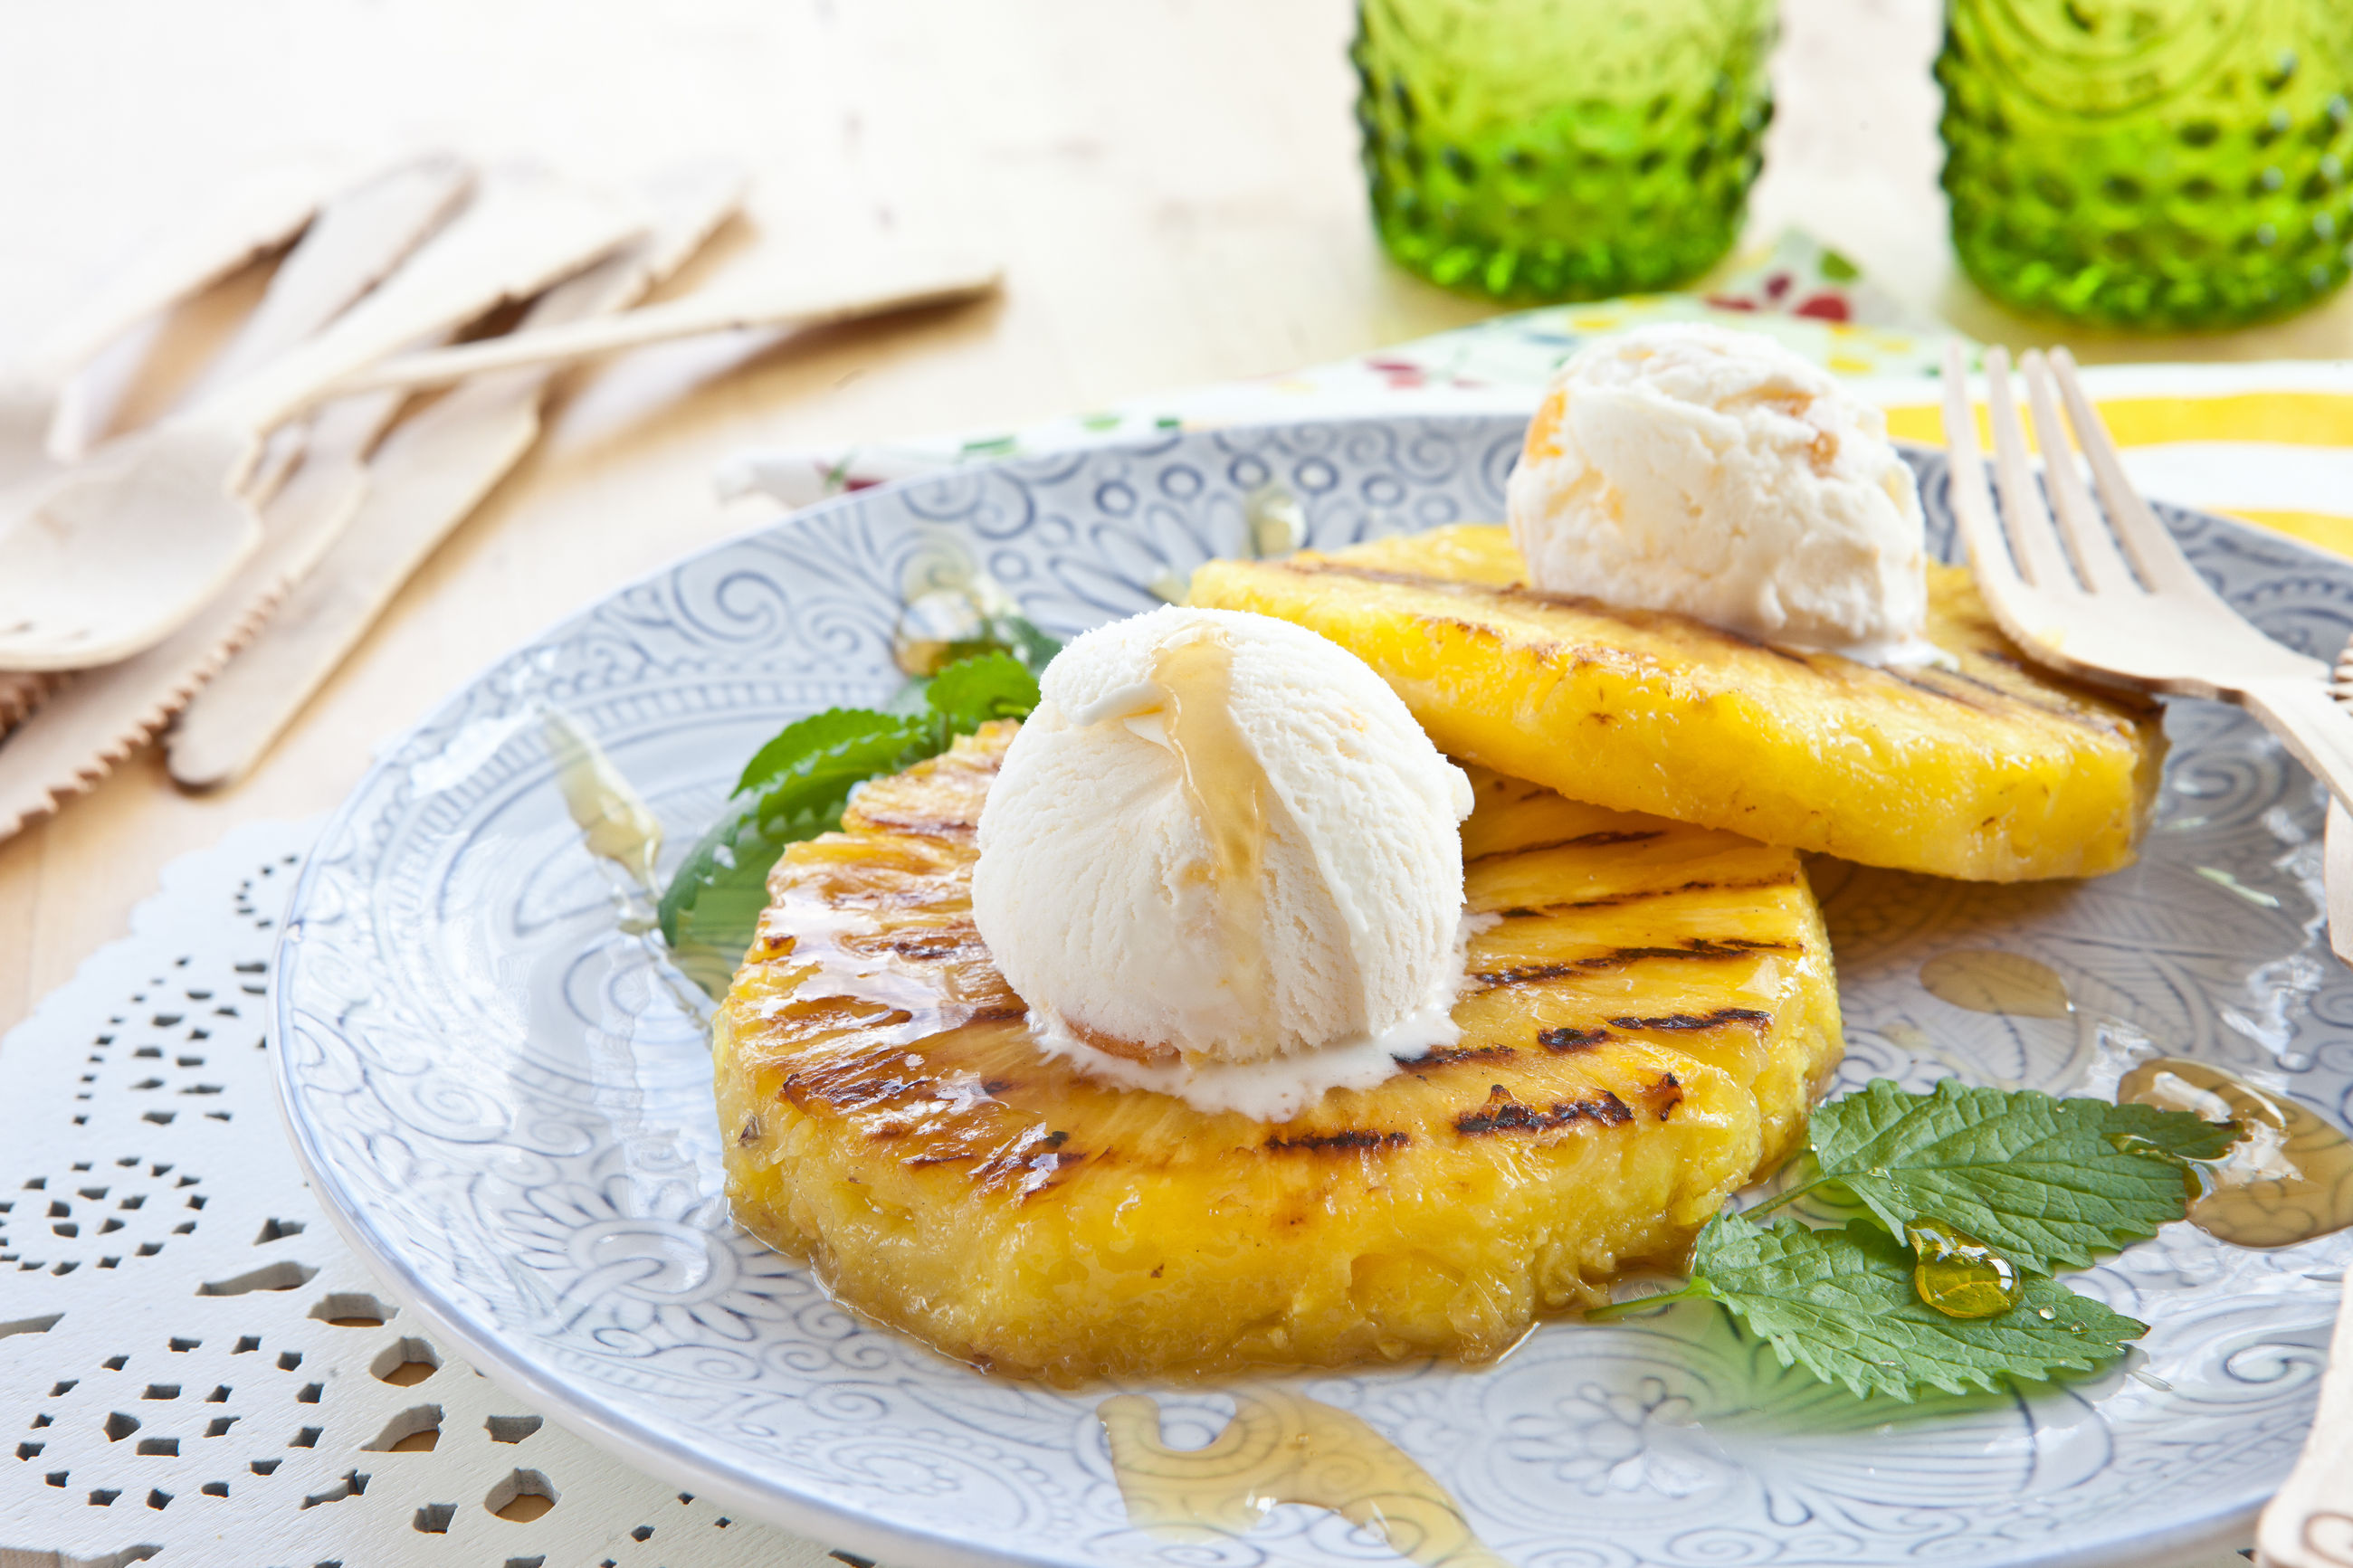 ананас на гриле с мороженым и джемом